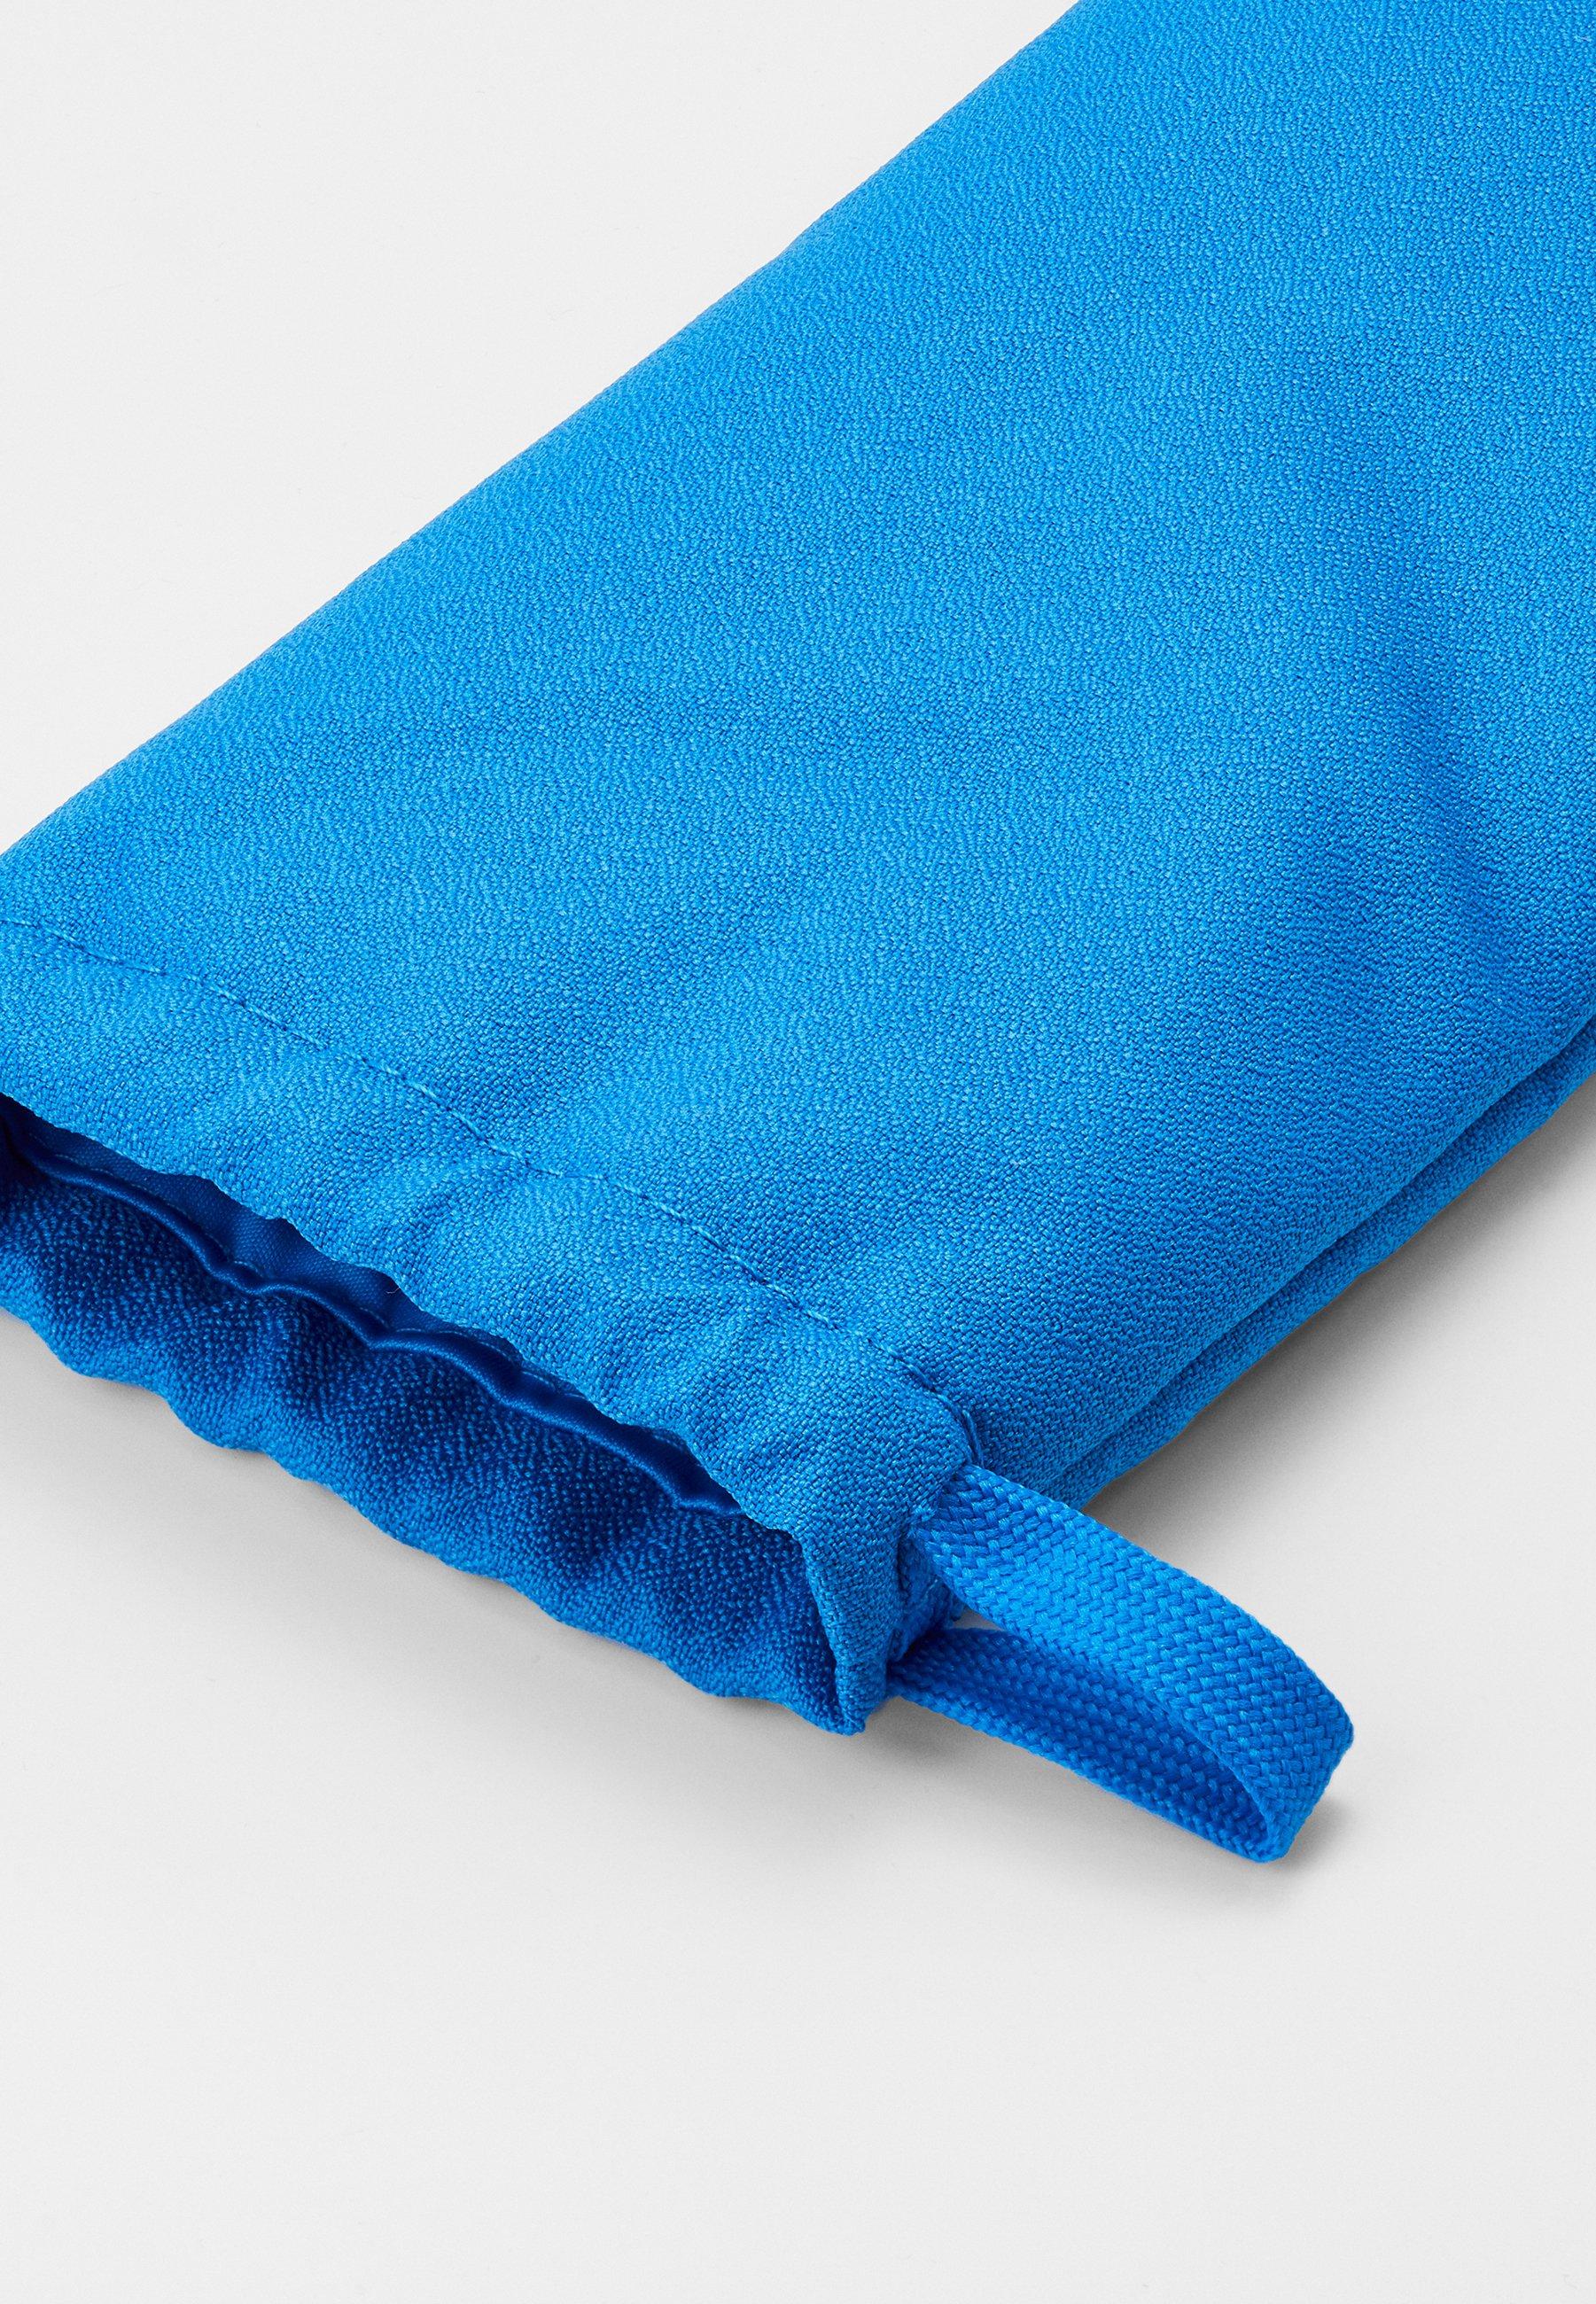 adidas Originals Solbriller - black/blue/svart ifoEXJfQx70XnB6